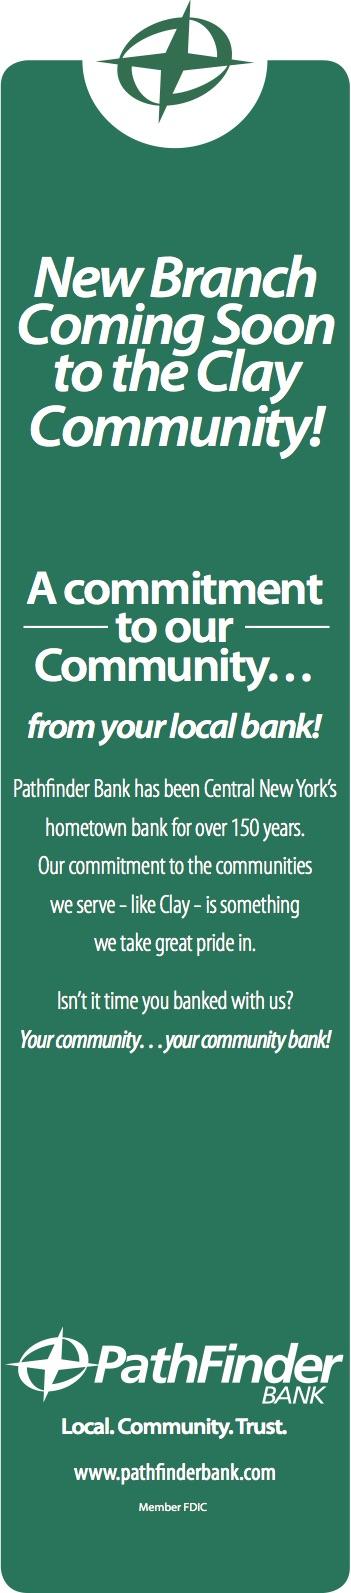 Pathfinder Bank < Table Hopping